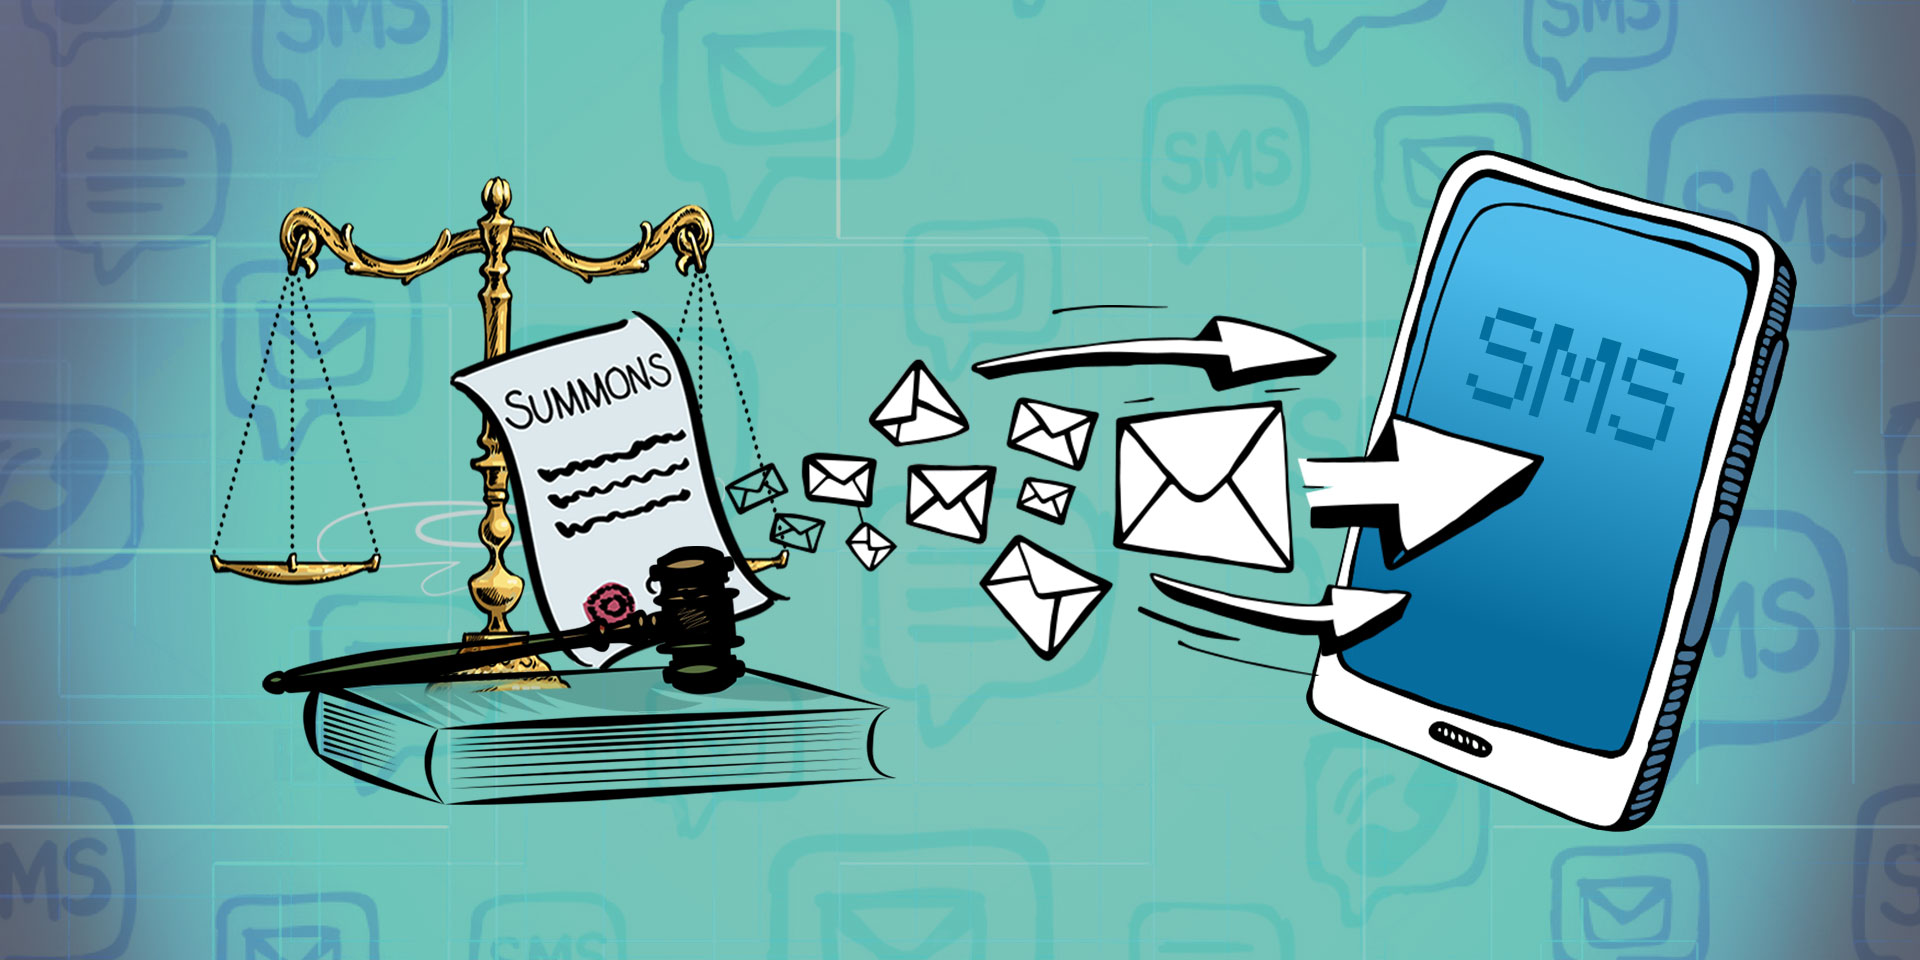 Госдума приняла закон об извещениях от судебных приставов в виде СМС